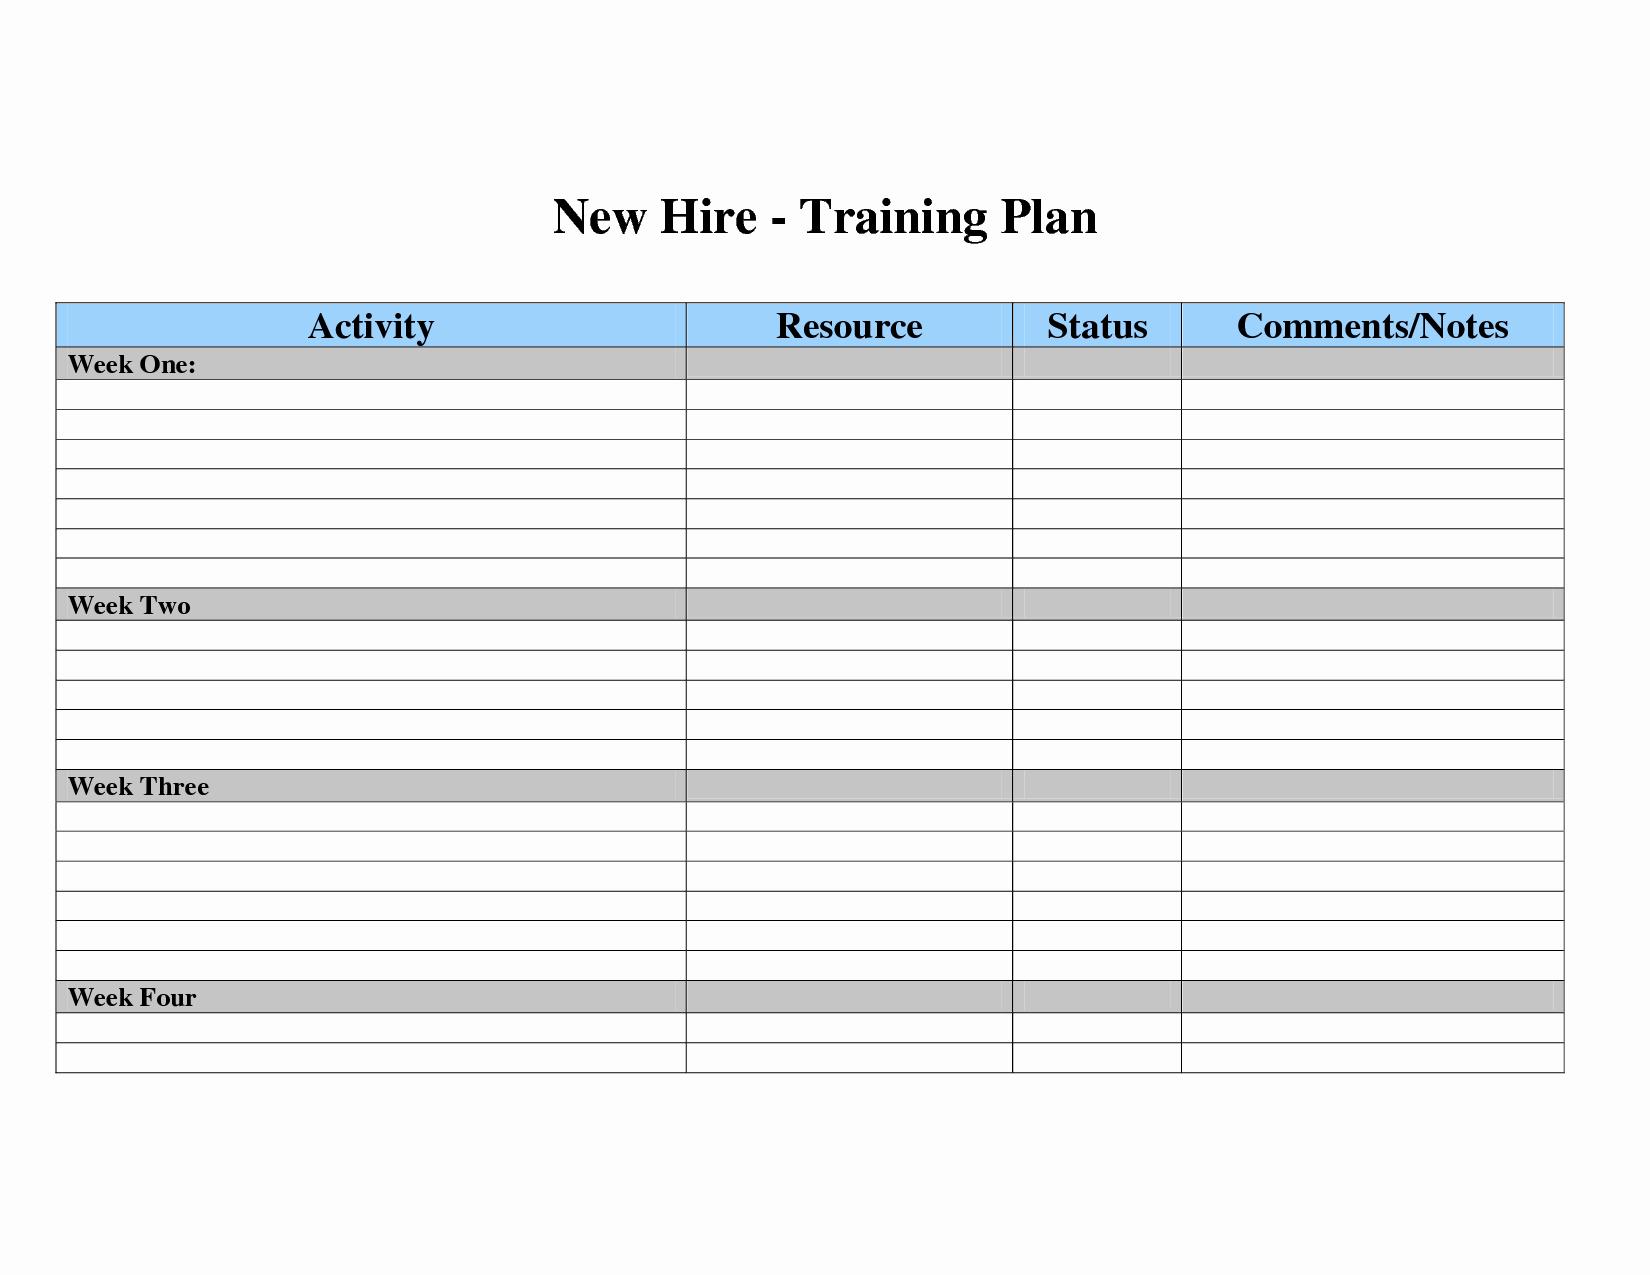 New Employee Training Plan Template Best Of Employee Training Plan Template